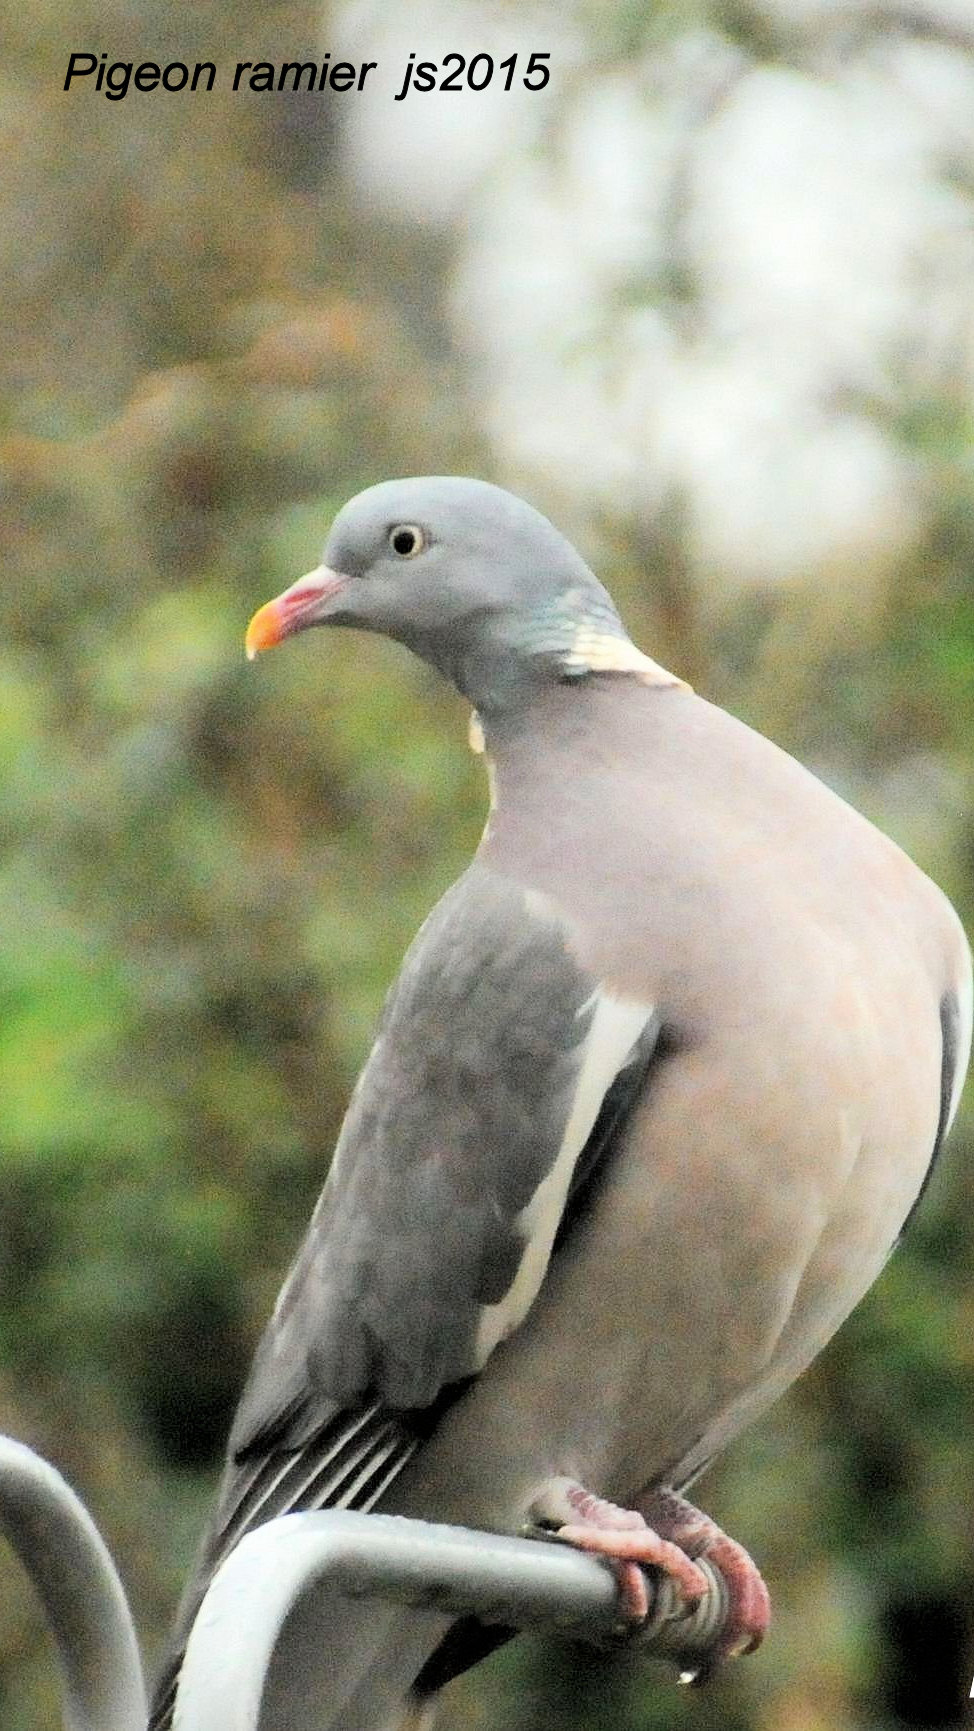 Pigeon ramier js2016.JPG